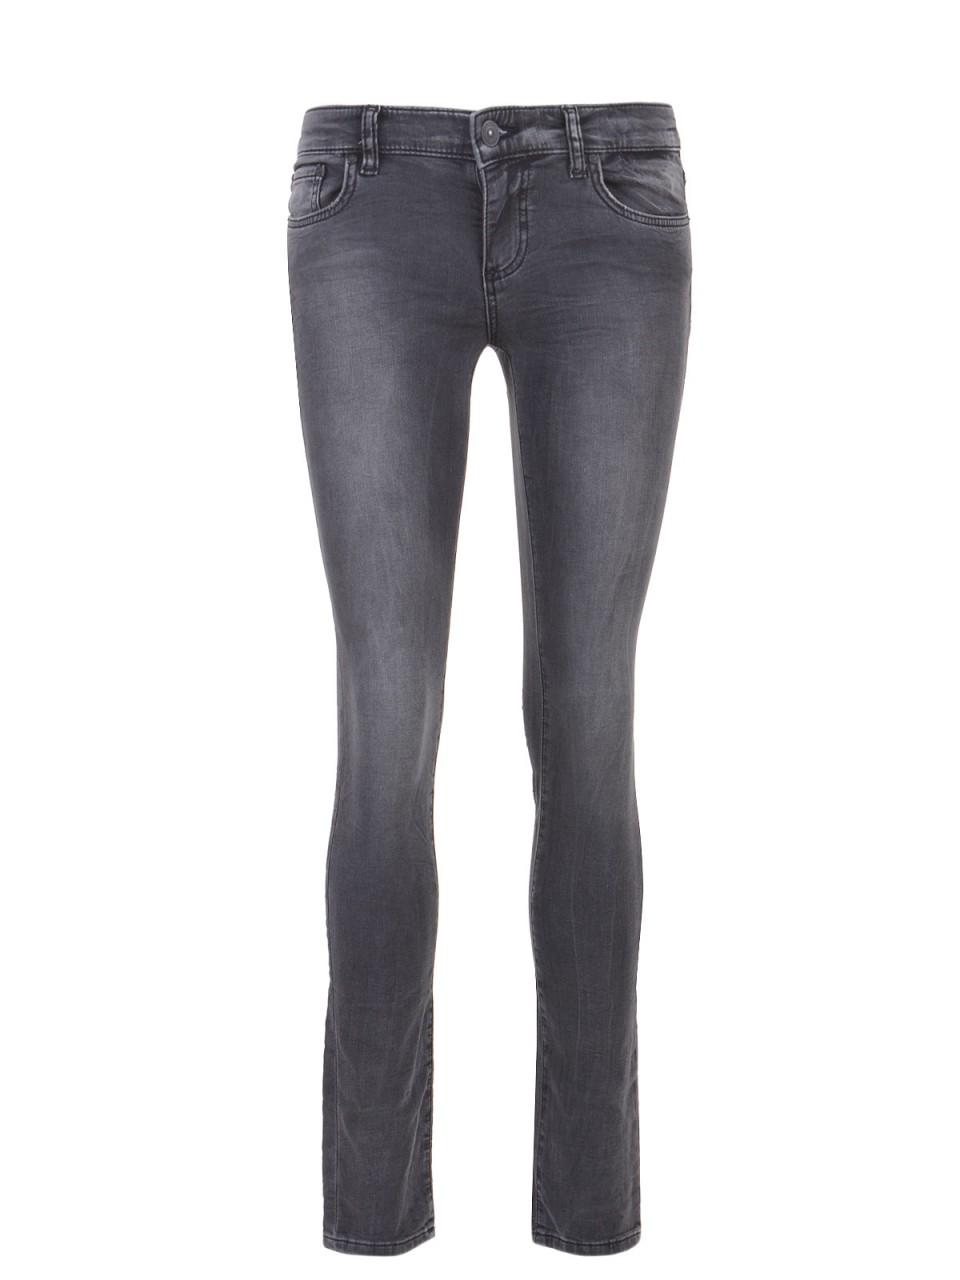 ltb-damen-jeans-dunkelgrau